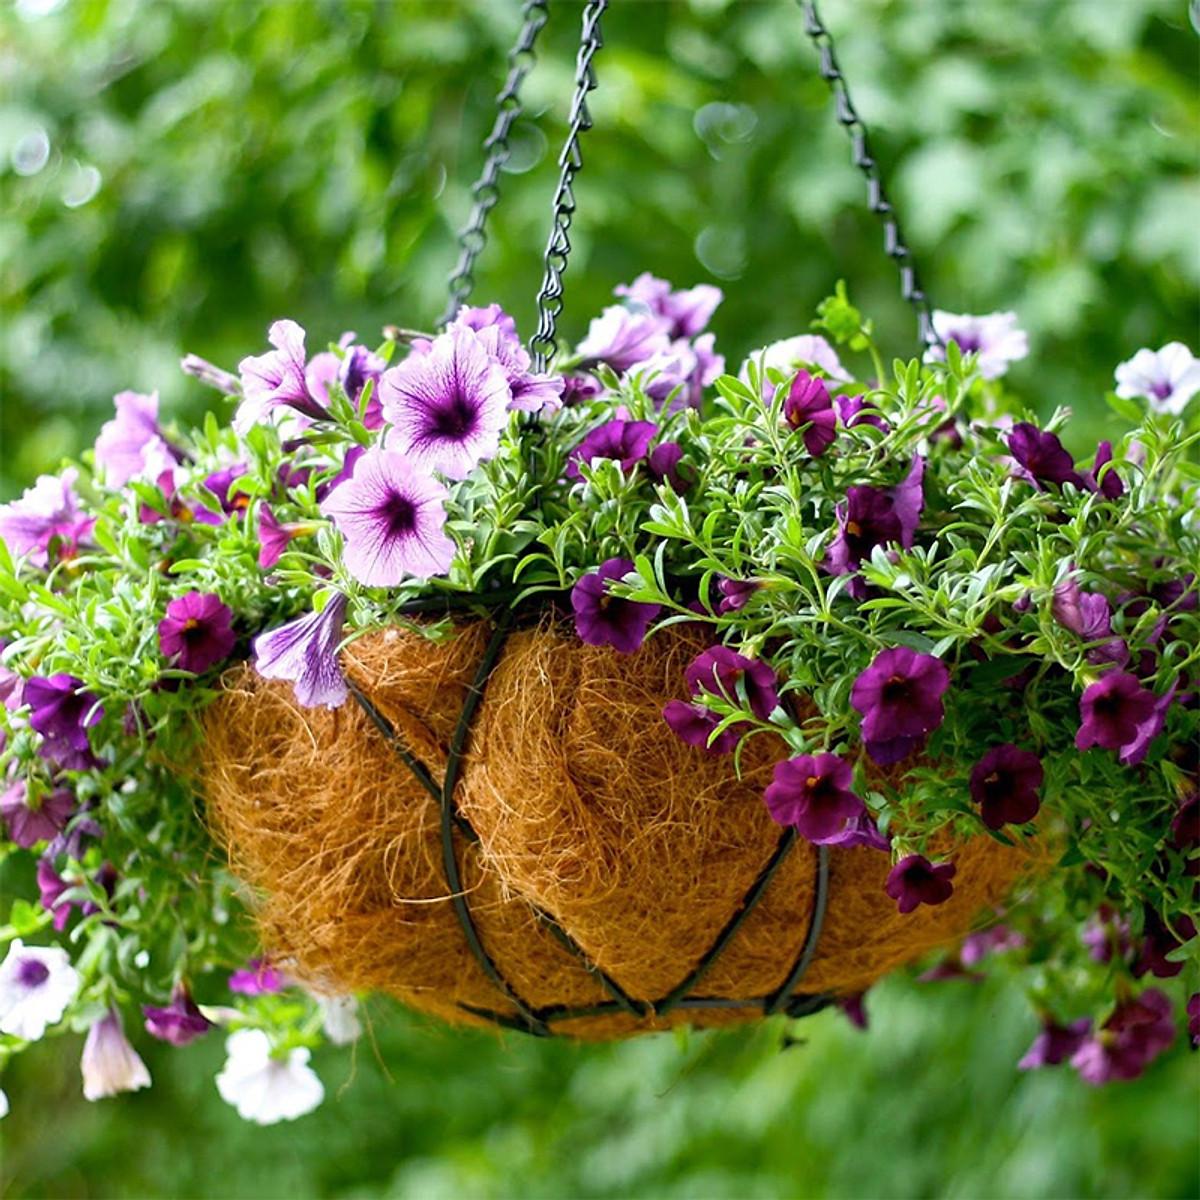 Hạt giống hoa Dạ yến thảo rủ Golden Seeds 50 Hạt - 2